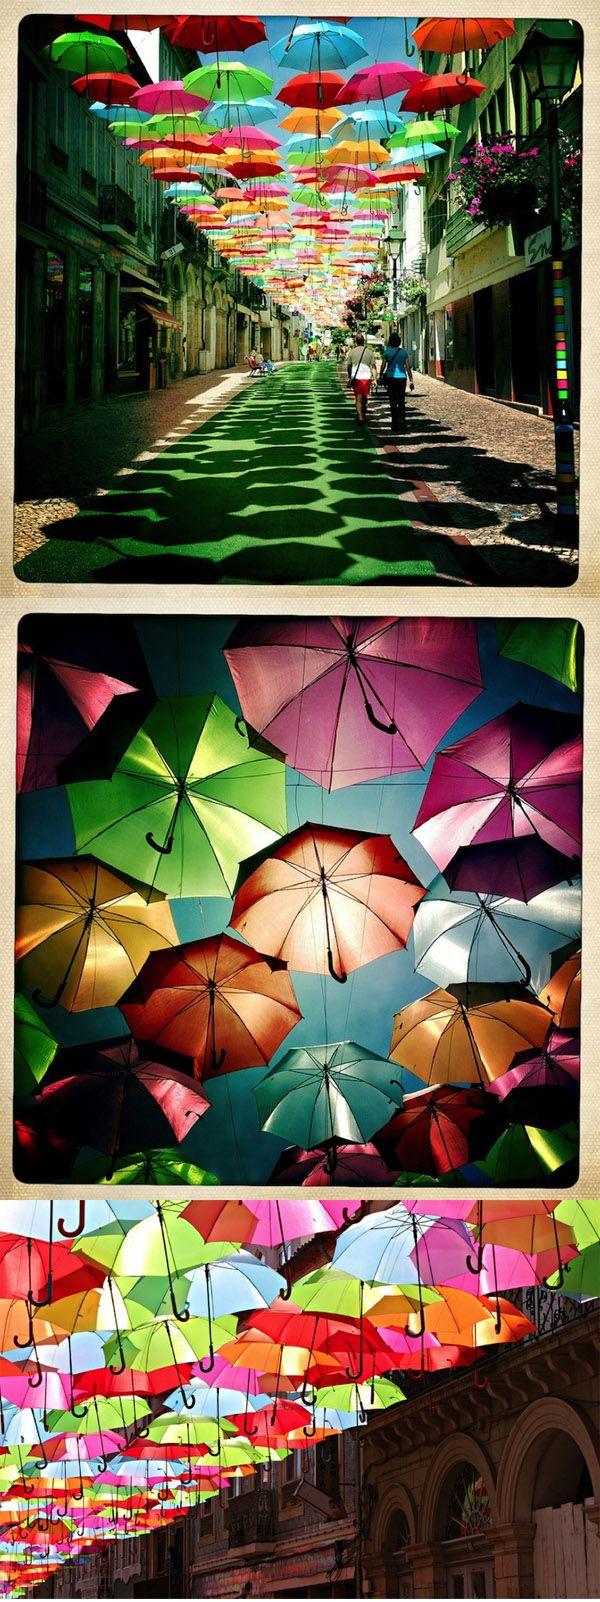 UMBRELLA INSTALLATION IN ÁGUEDA, PORTUGAL ( photos by Patrícia Almeida :: http://www.mymodernmet.com/profiles/blogs/colorful-floating-umbrellas-portugal )